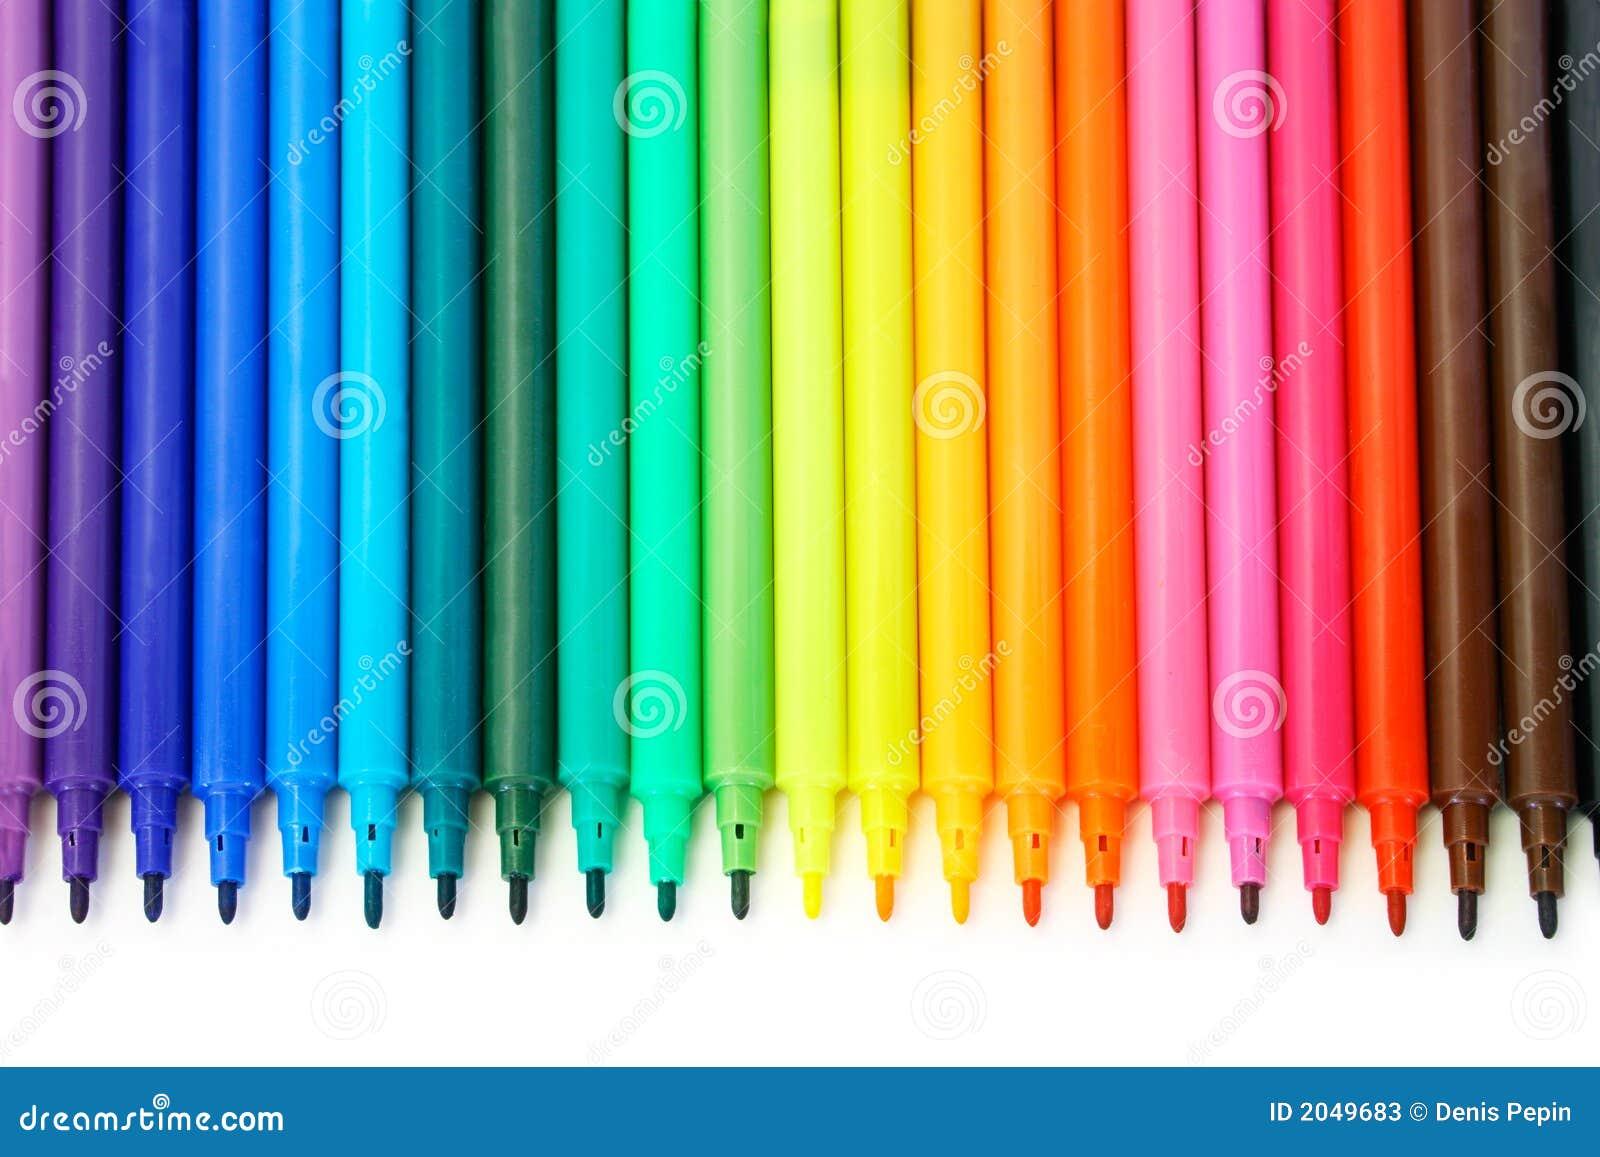 crayons lecteurs feutres multicolores photos stock image. Black Bedroom Furniture Sets. Home Design Ideas